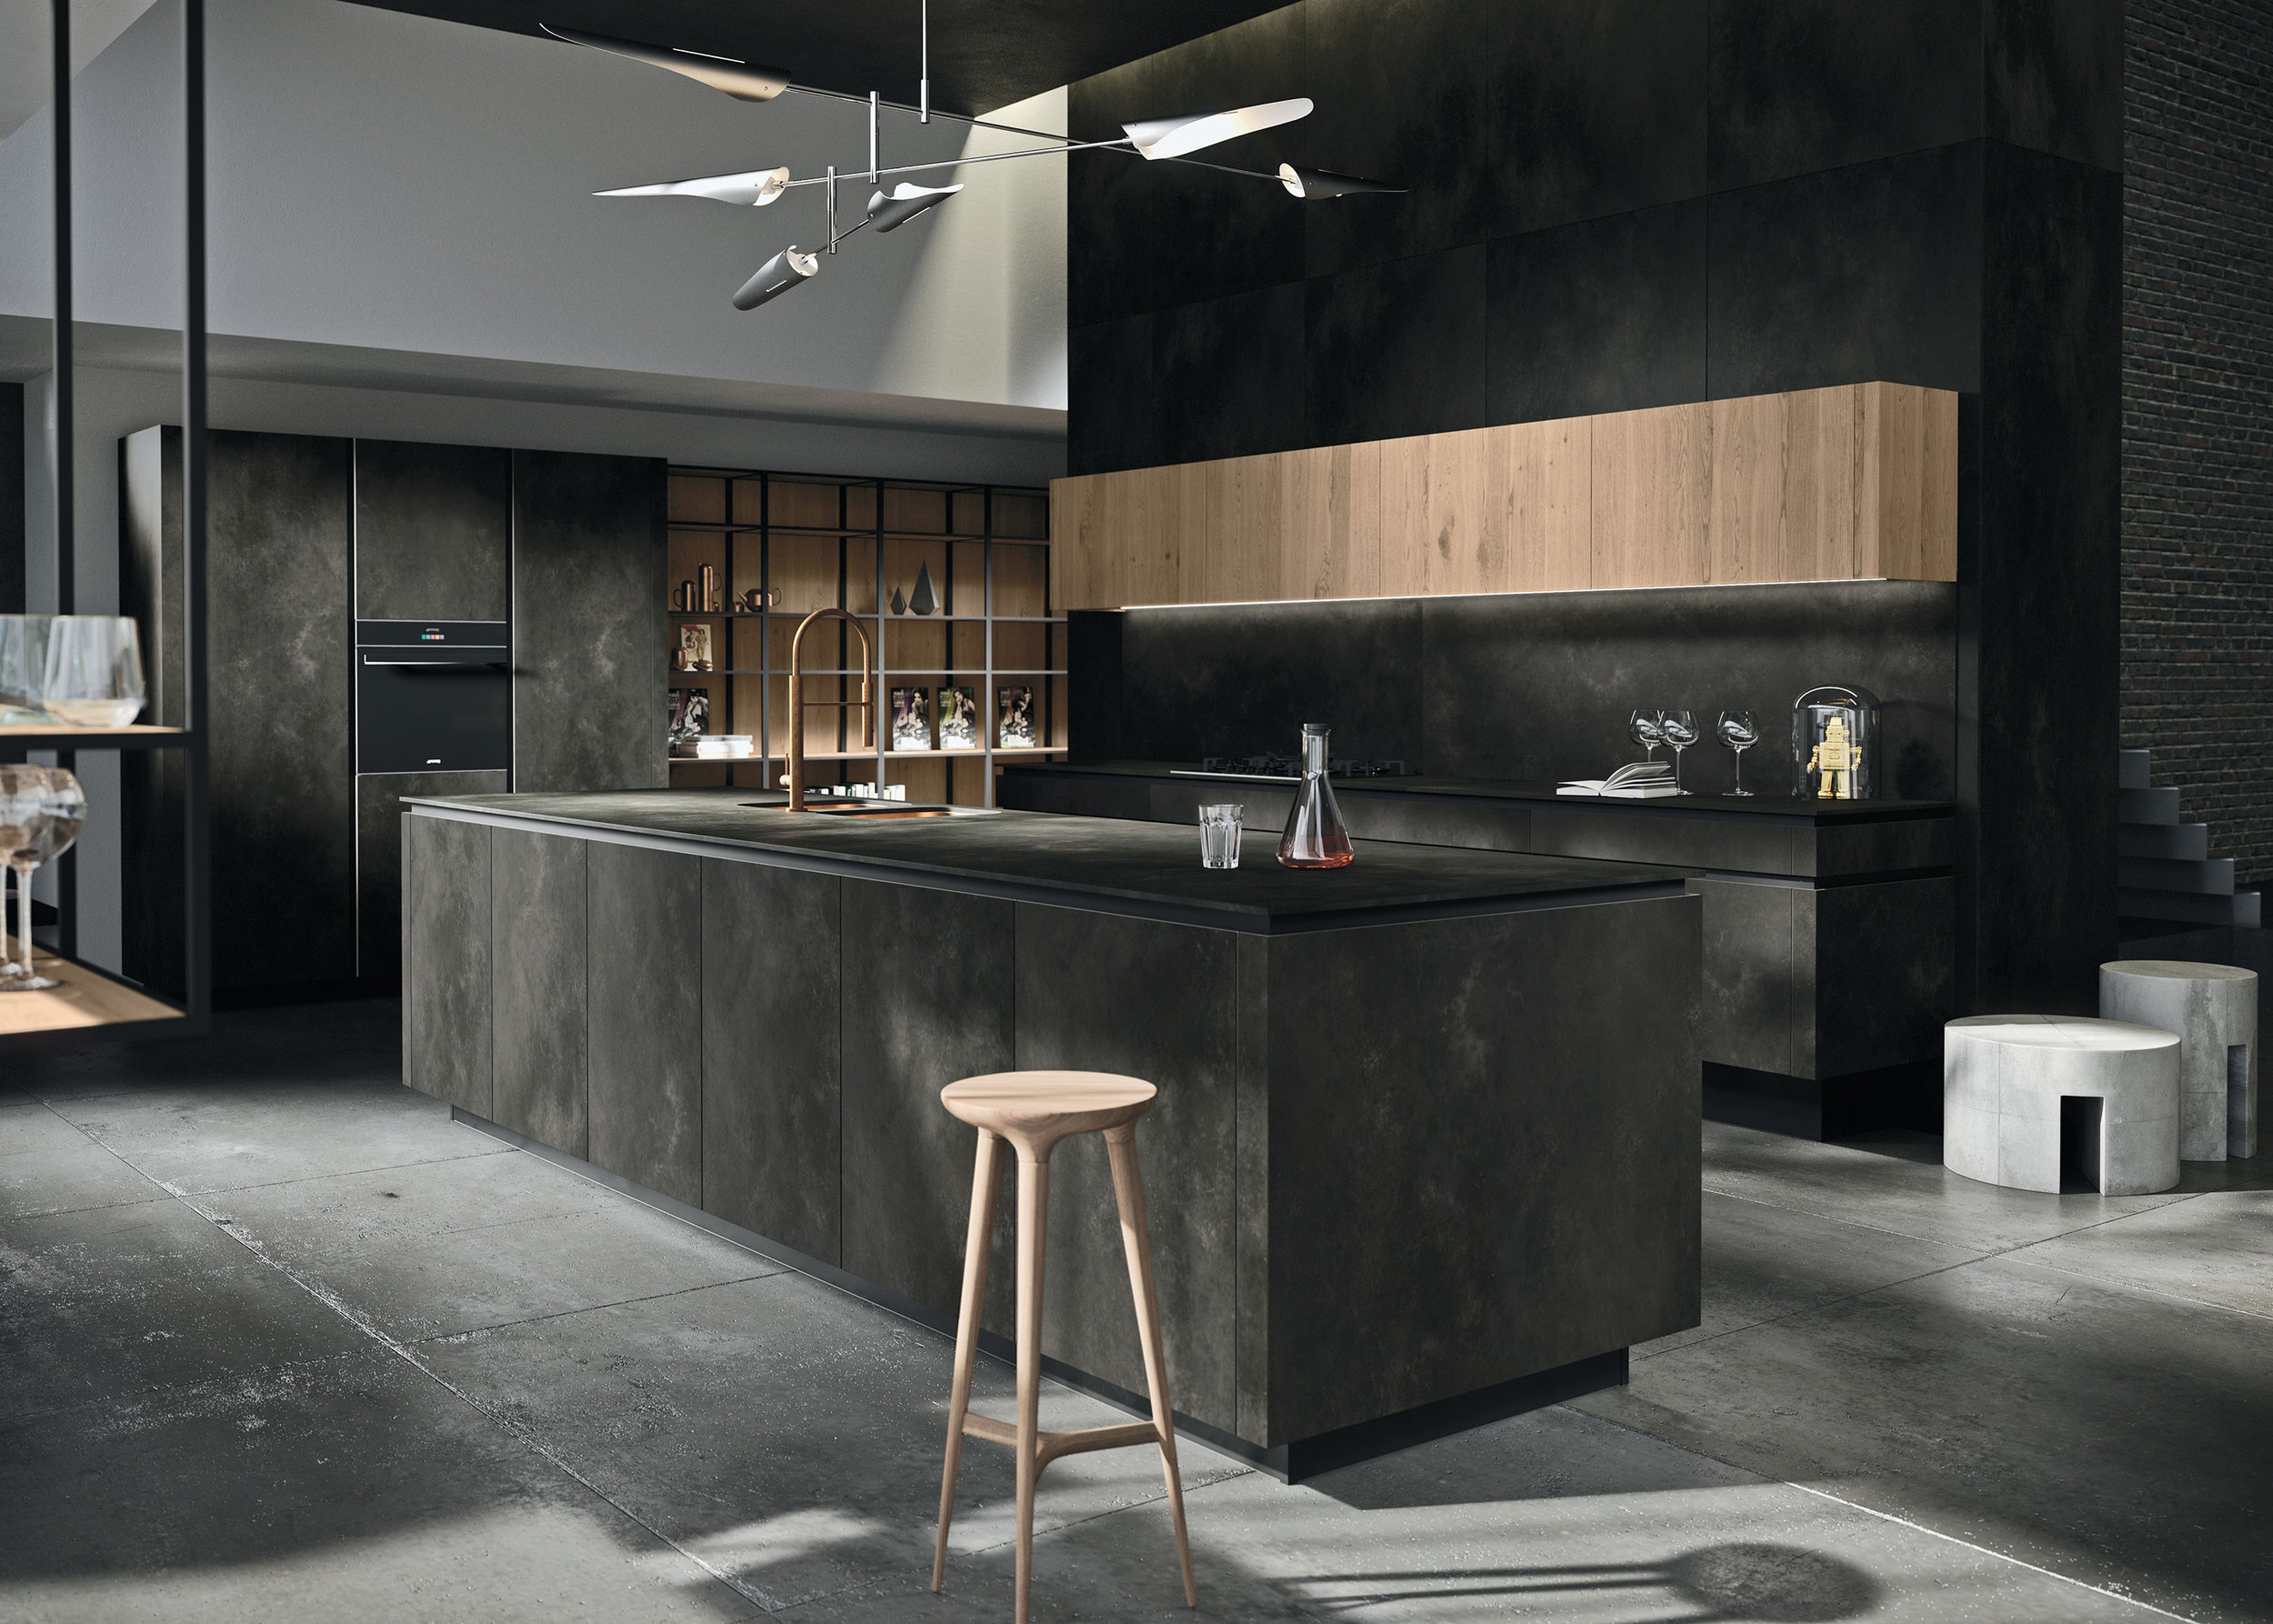 snaidero-year-2017-way-ceramica-kitchen-laminam-12-ossido-nero-snaidero-vs-scavolini-snaidero-usa-inc.jpg